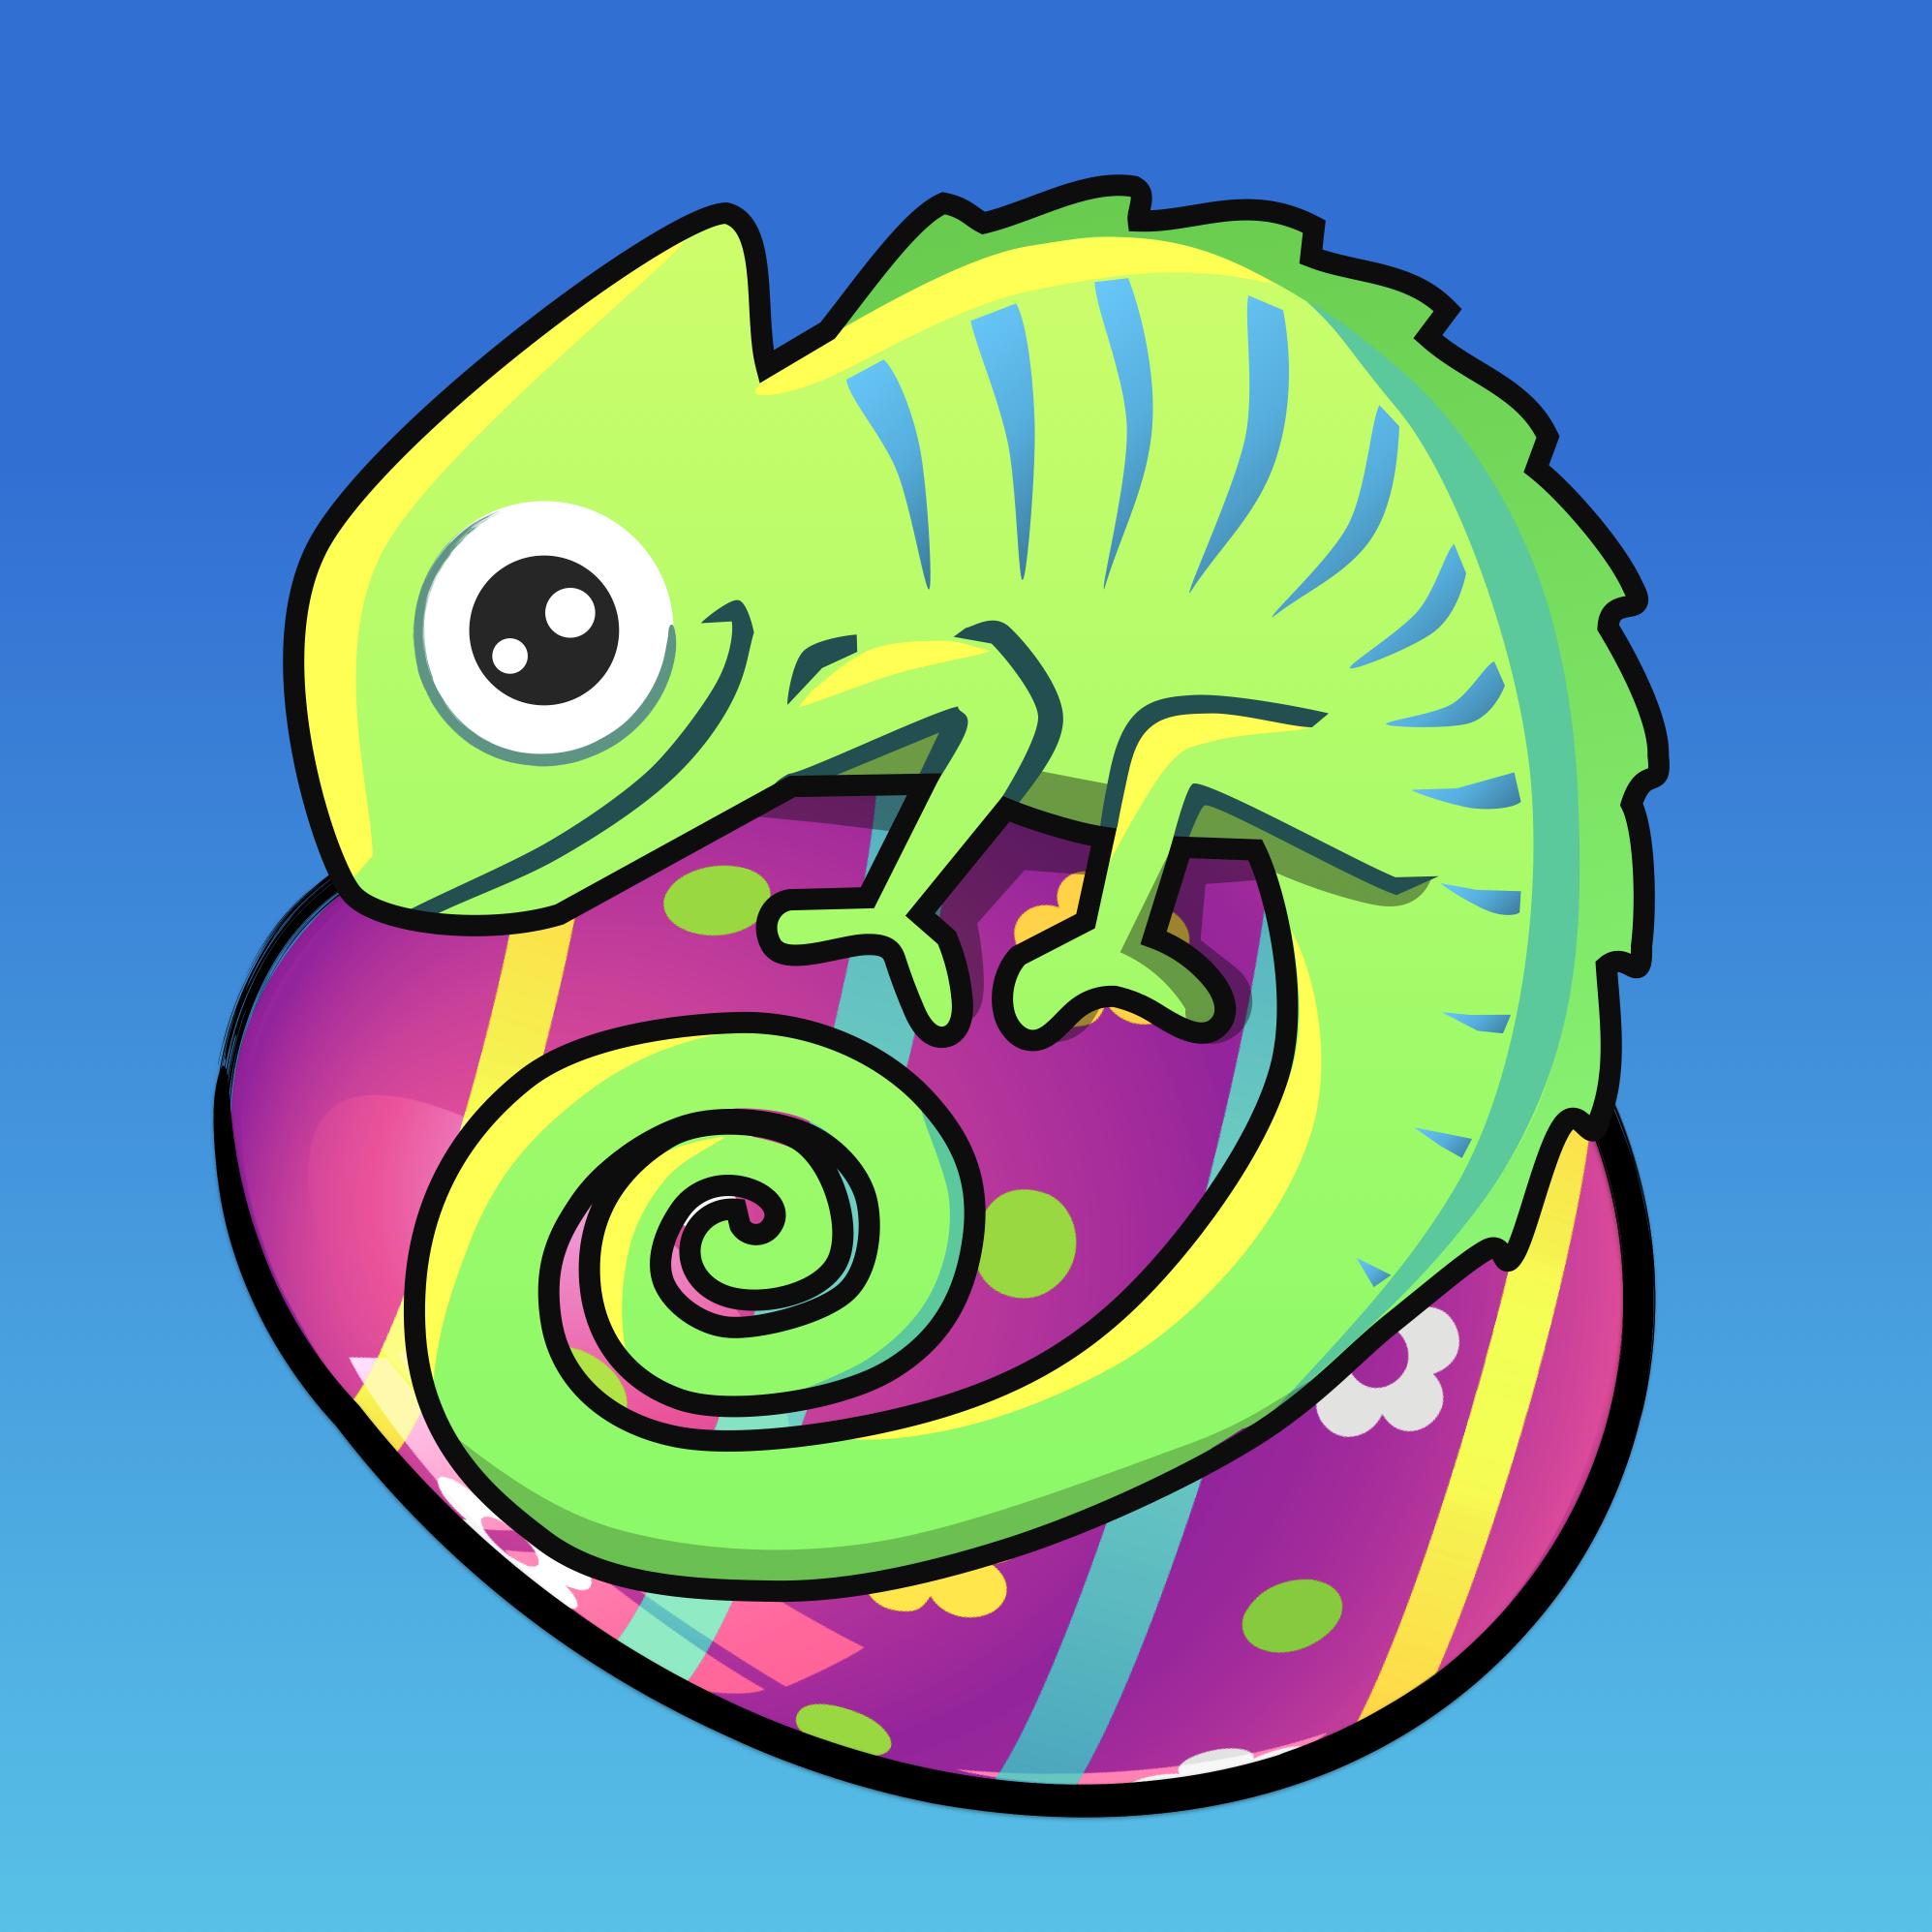 App_Icon_24bit.png